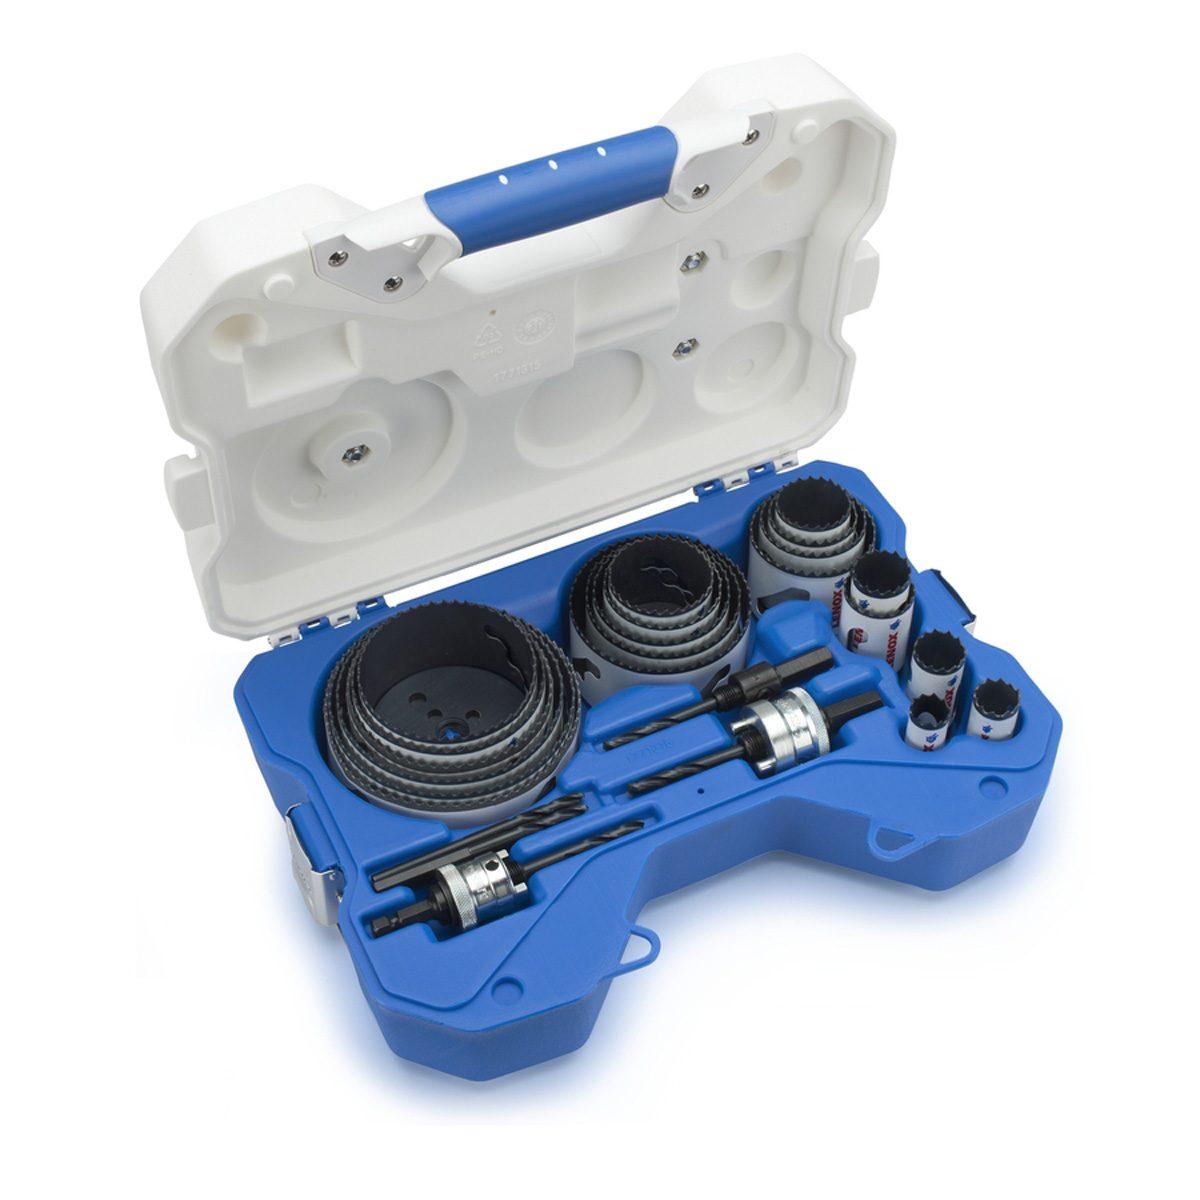 Lenox-26-piece-hole-saw-kit